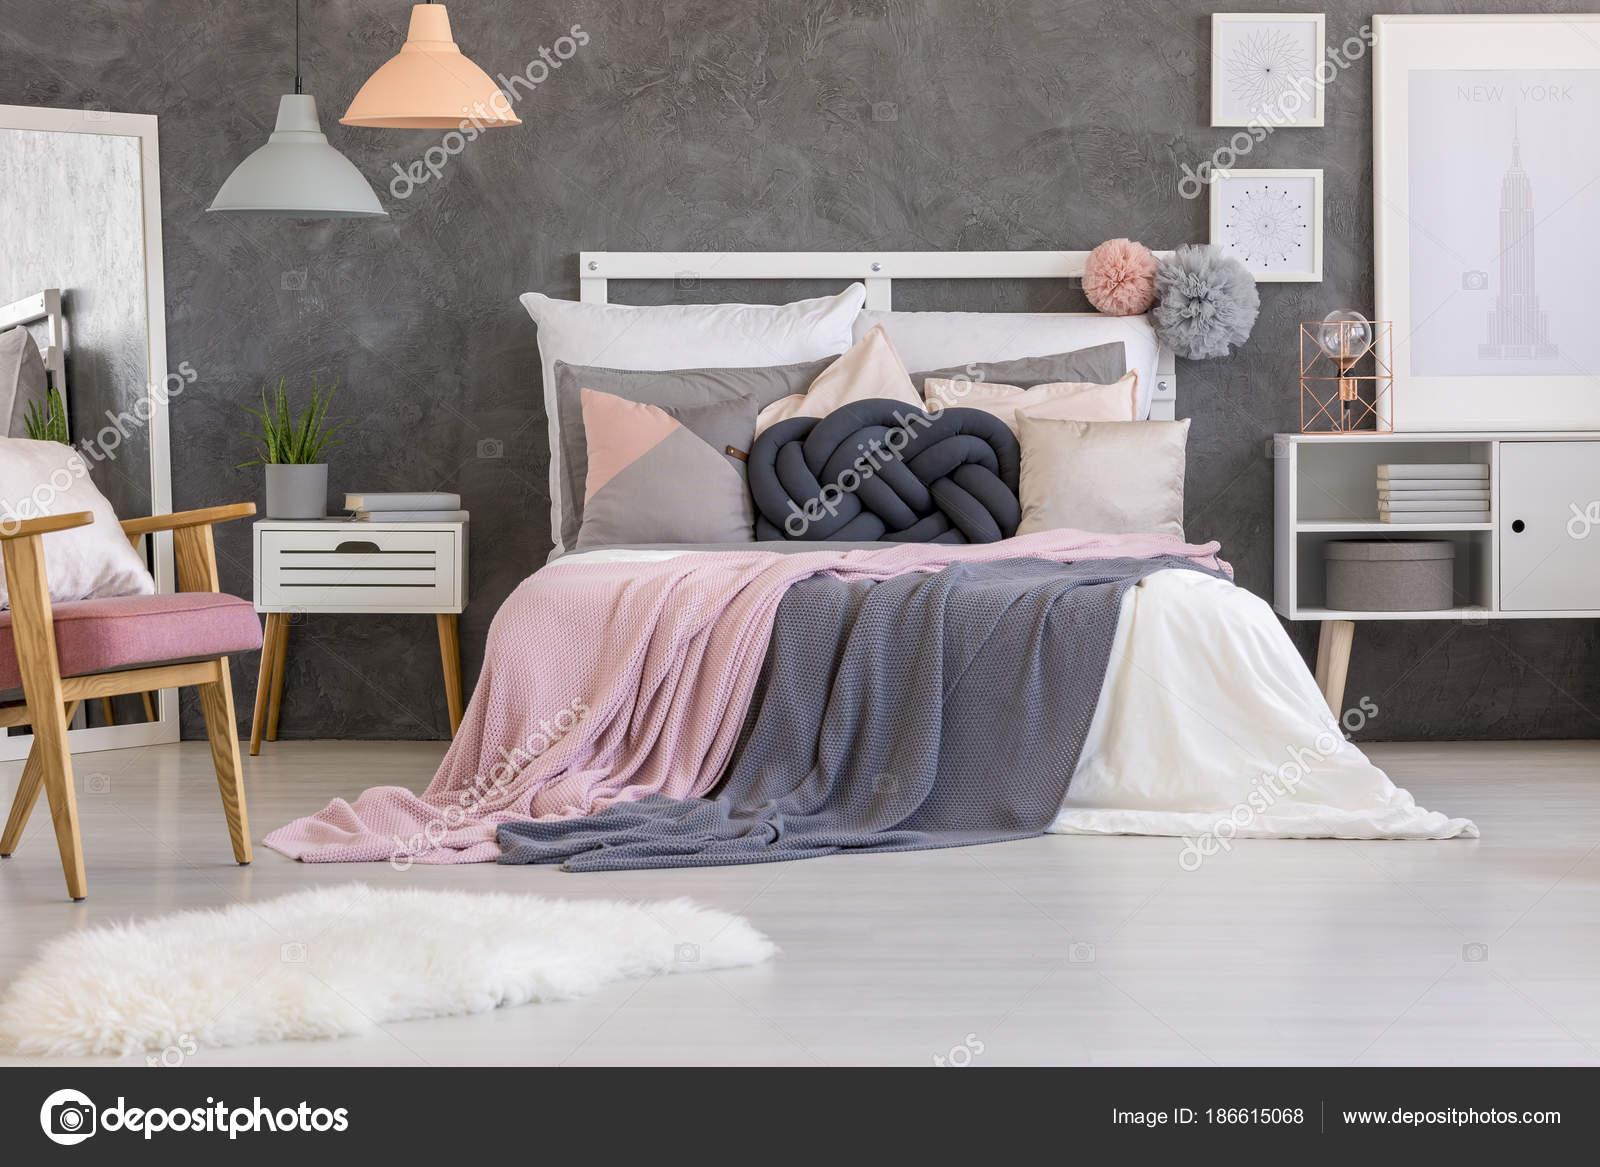 Slaapkamer Grijs Roze : Roze en grijs slaapkamer interieur u stockfoto photographee eu